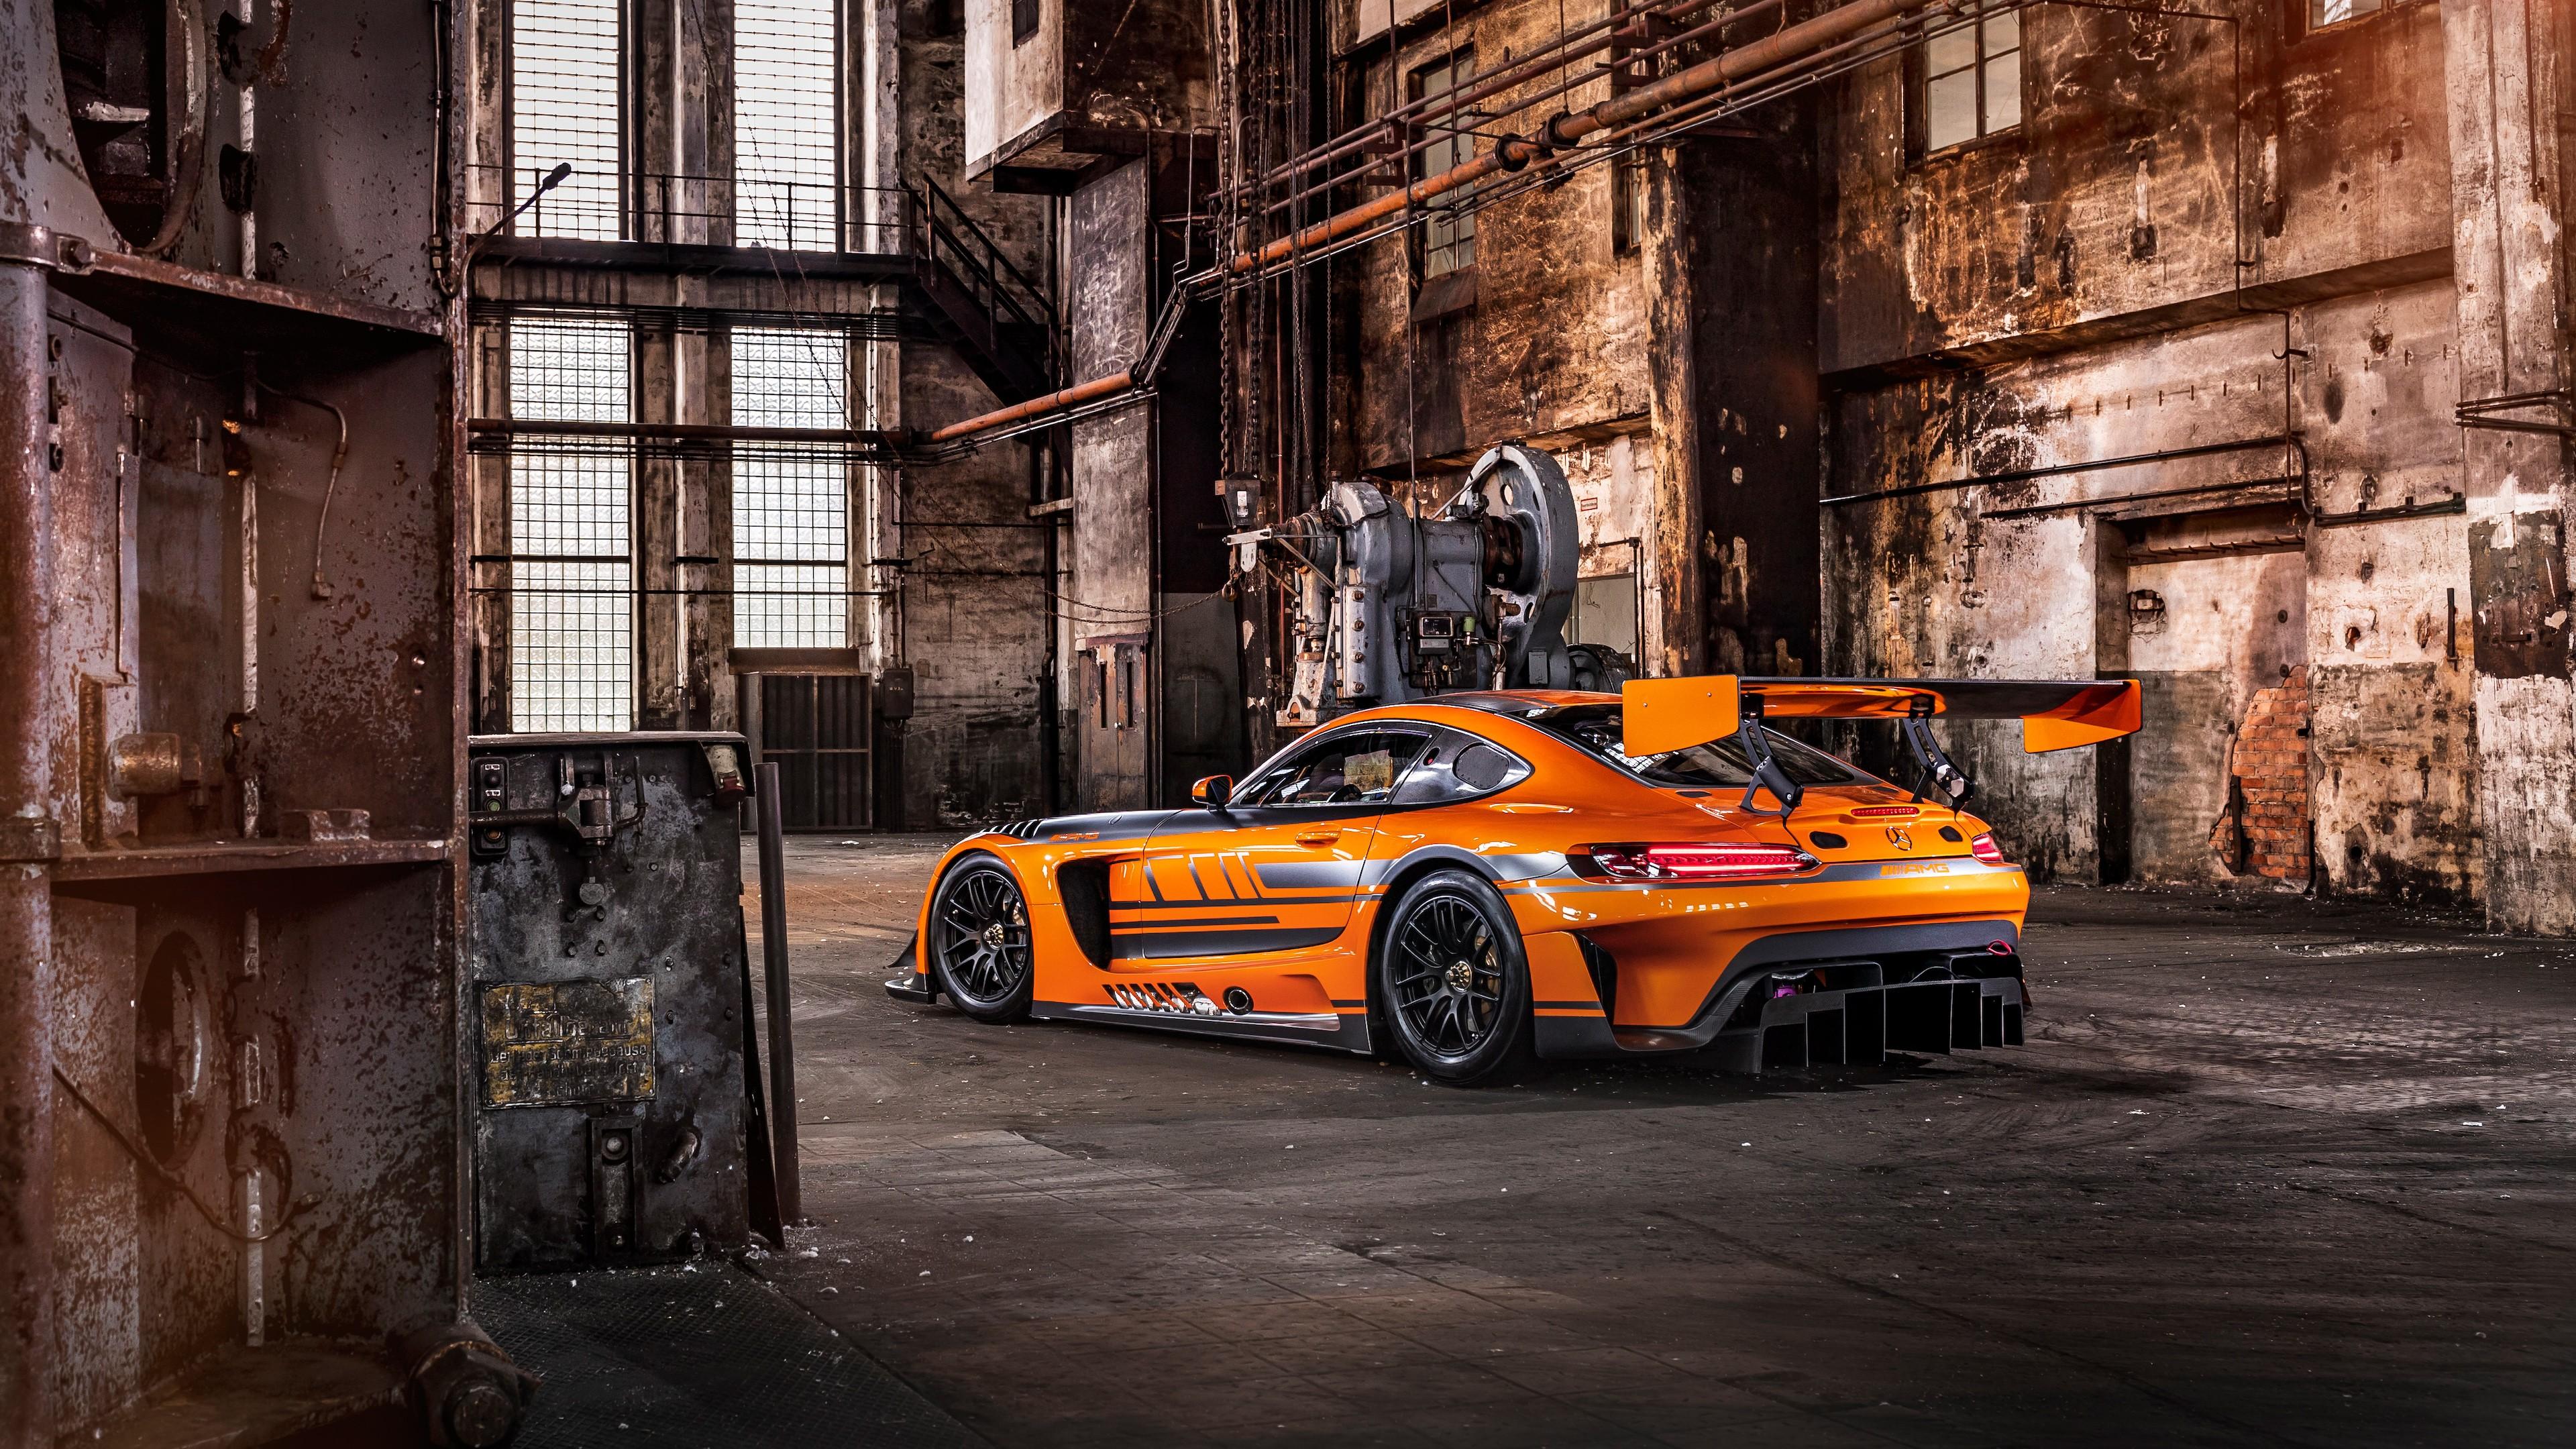 Mercedes-AMG GT3 2019 4K 2 Wallpaper   HD Car Wallpapers ...